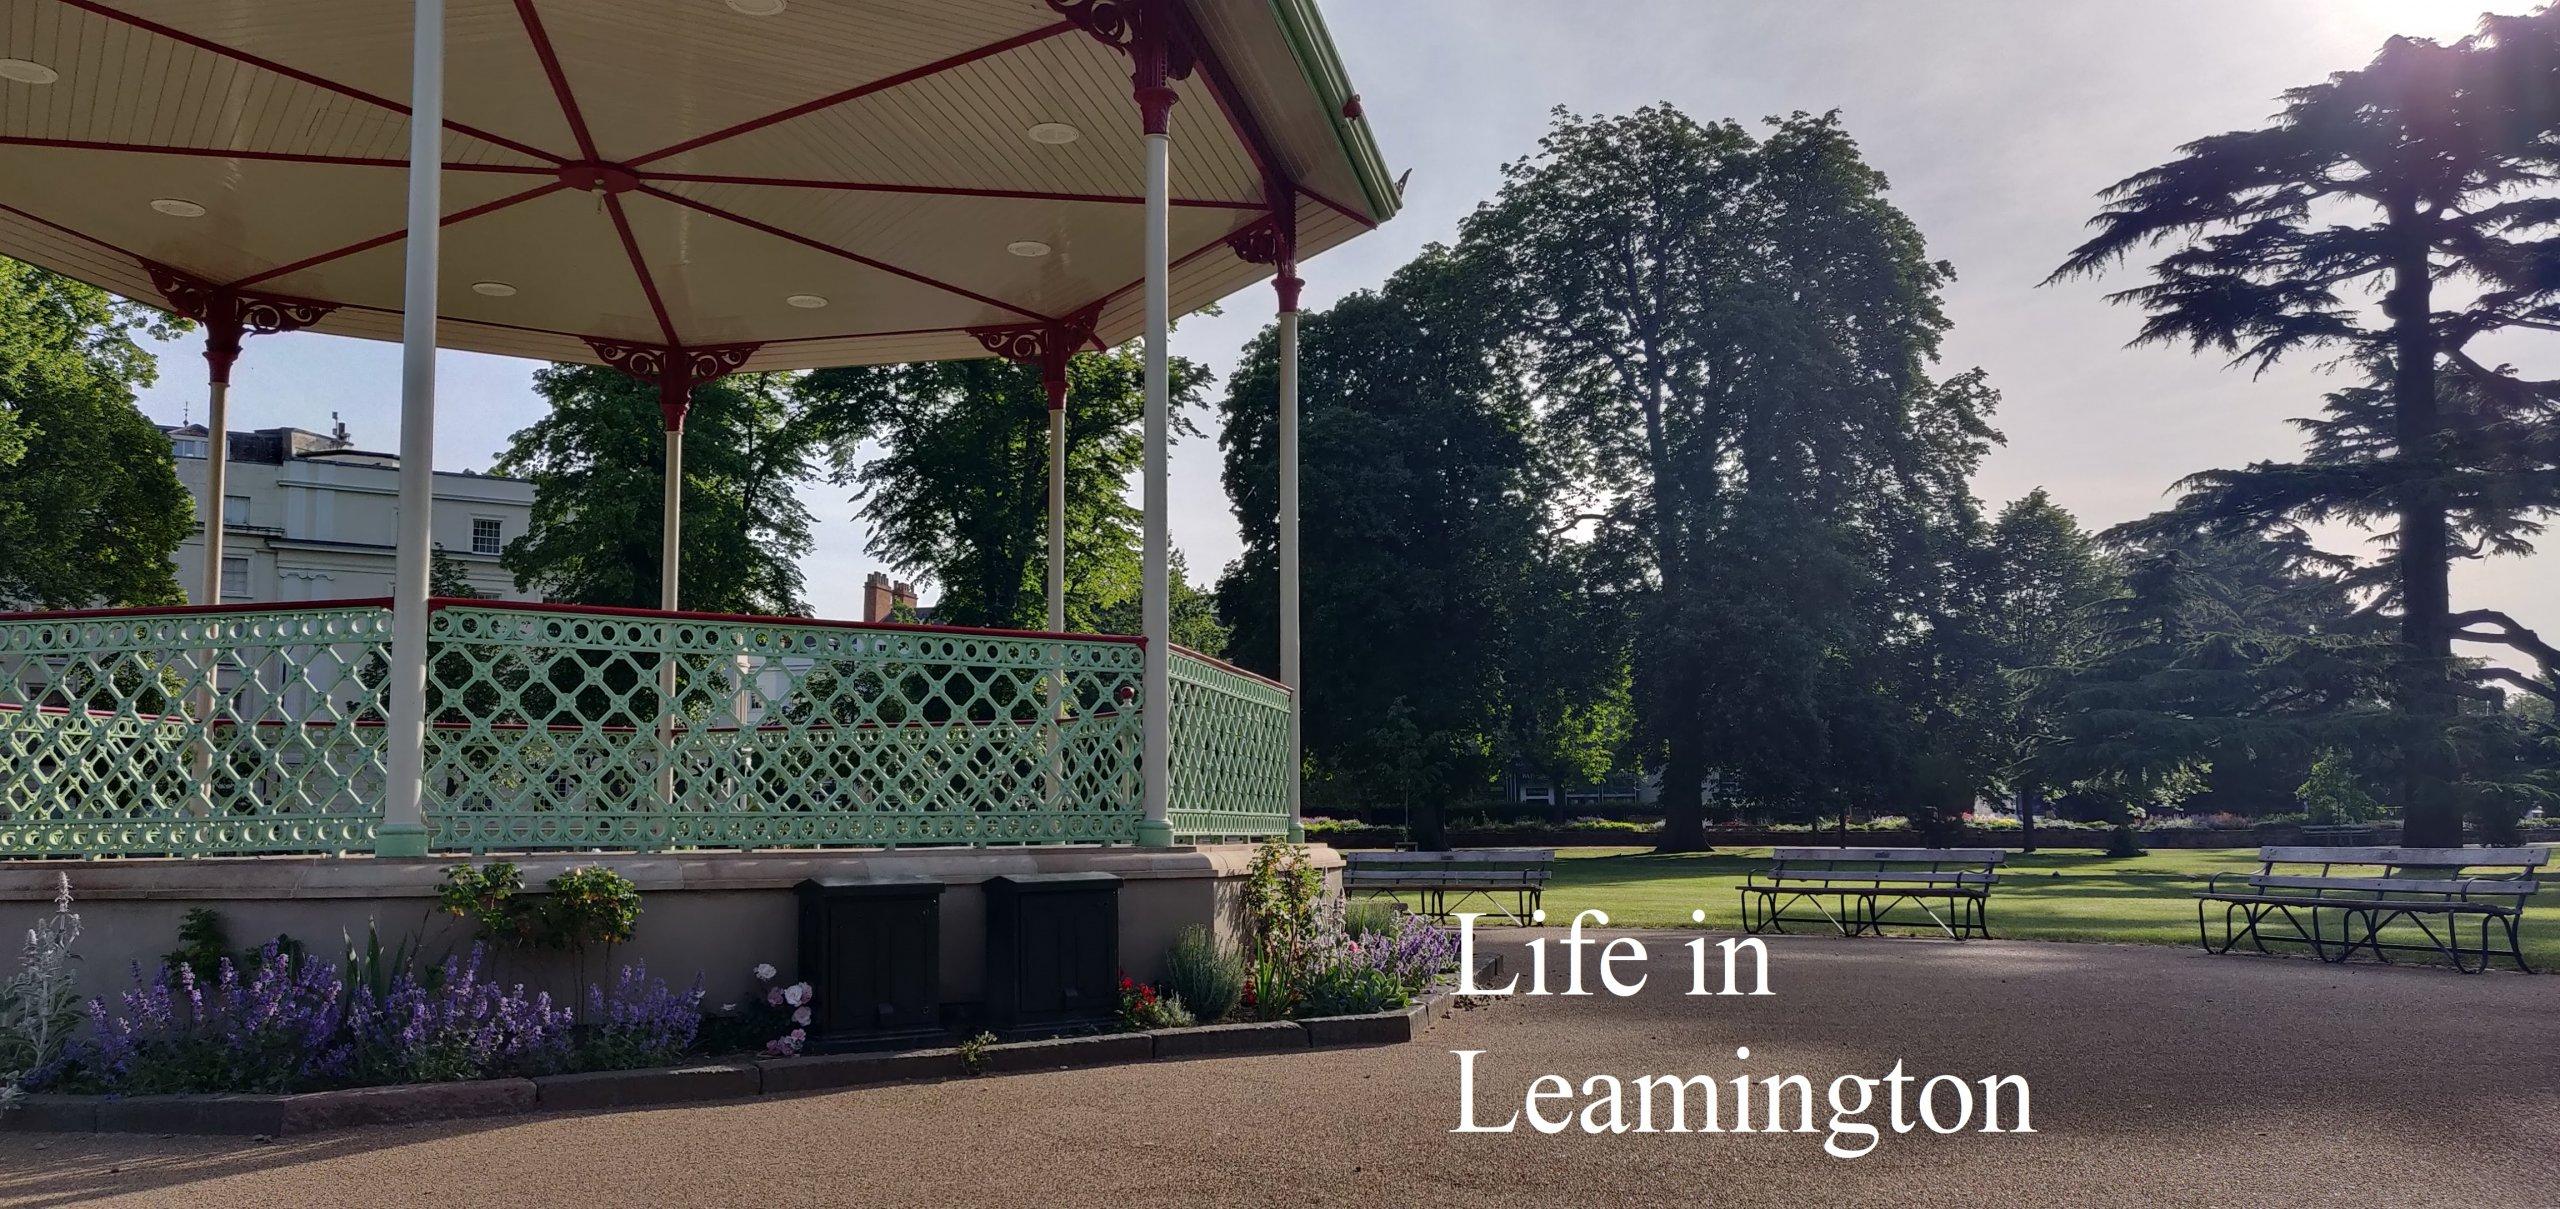 Life in Leamington